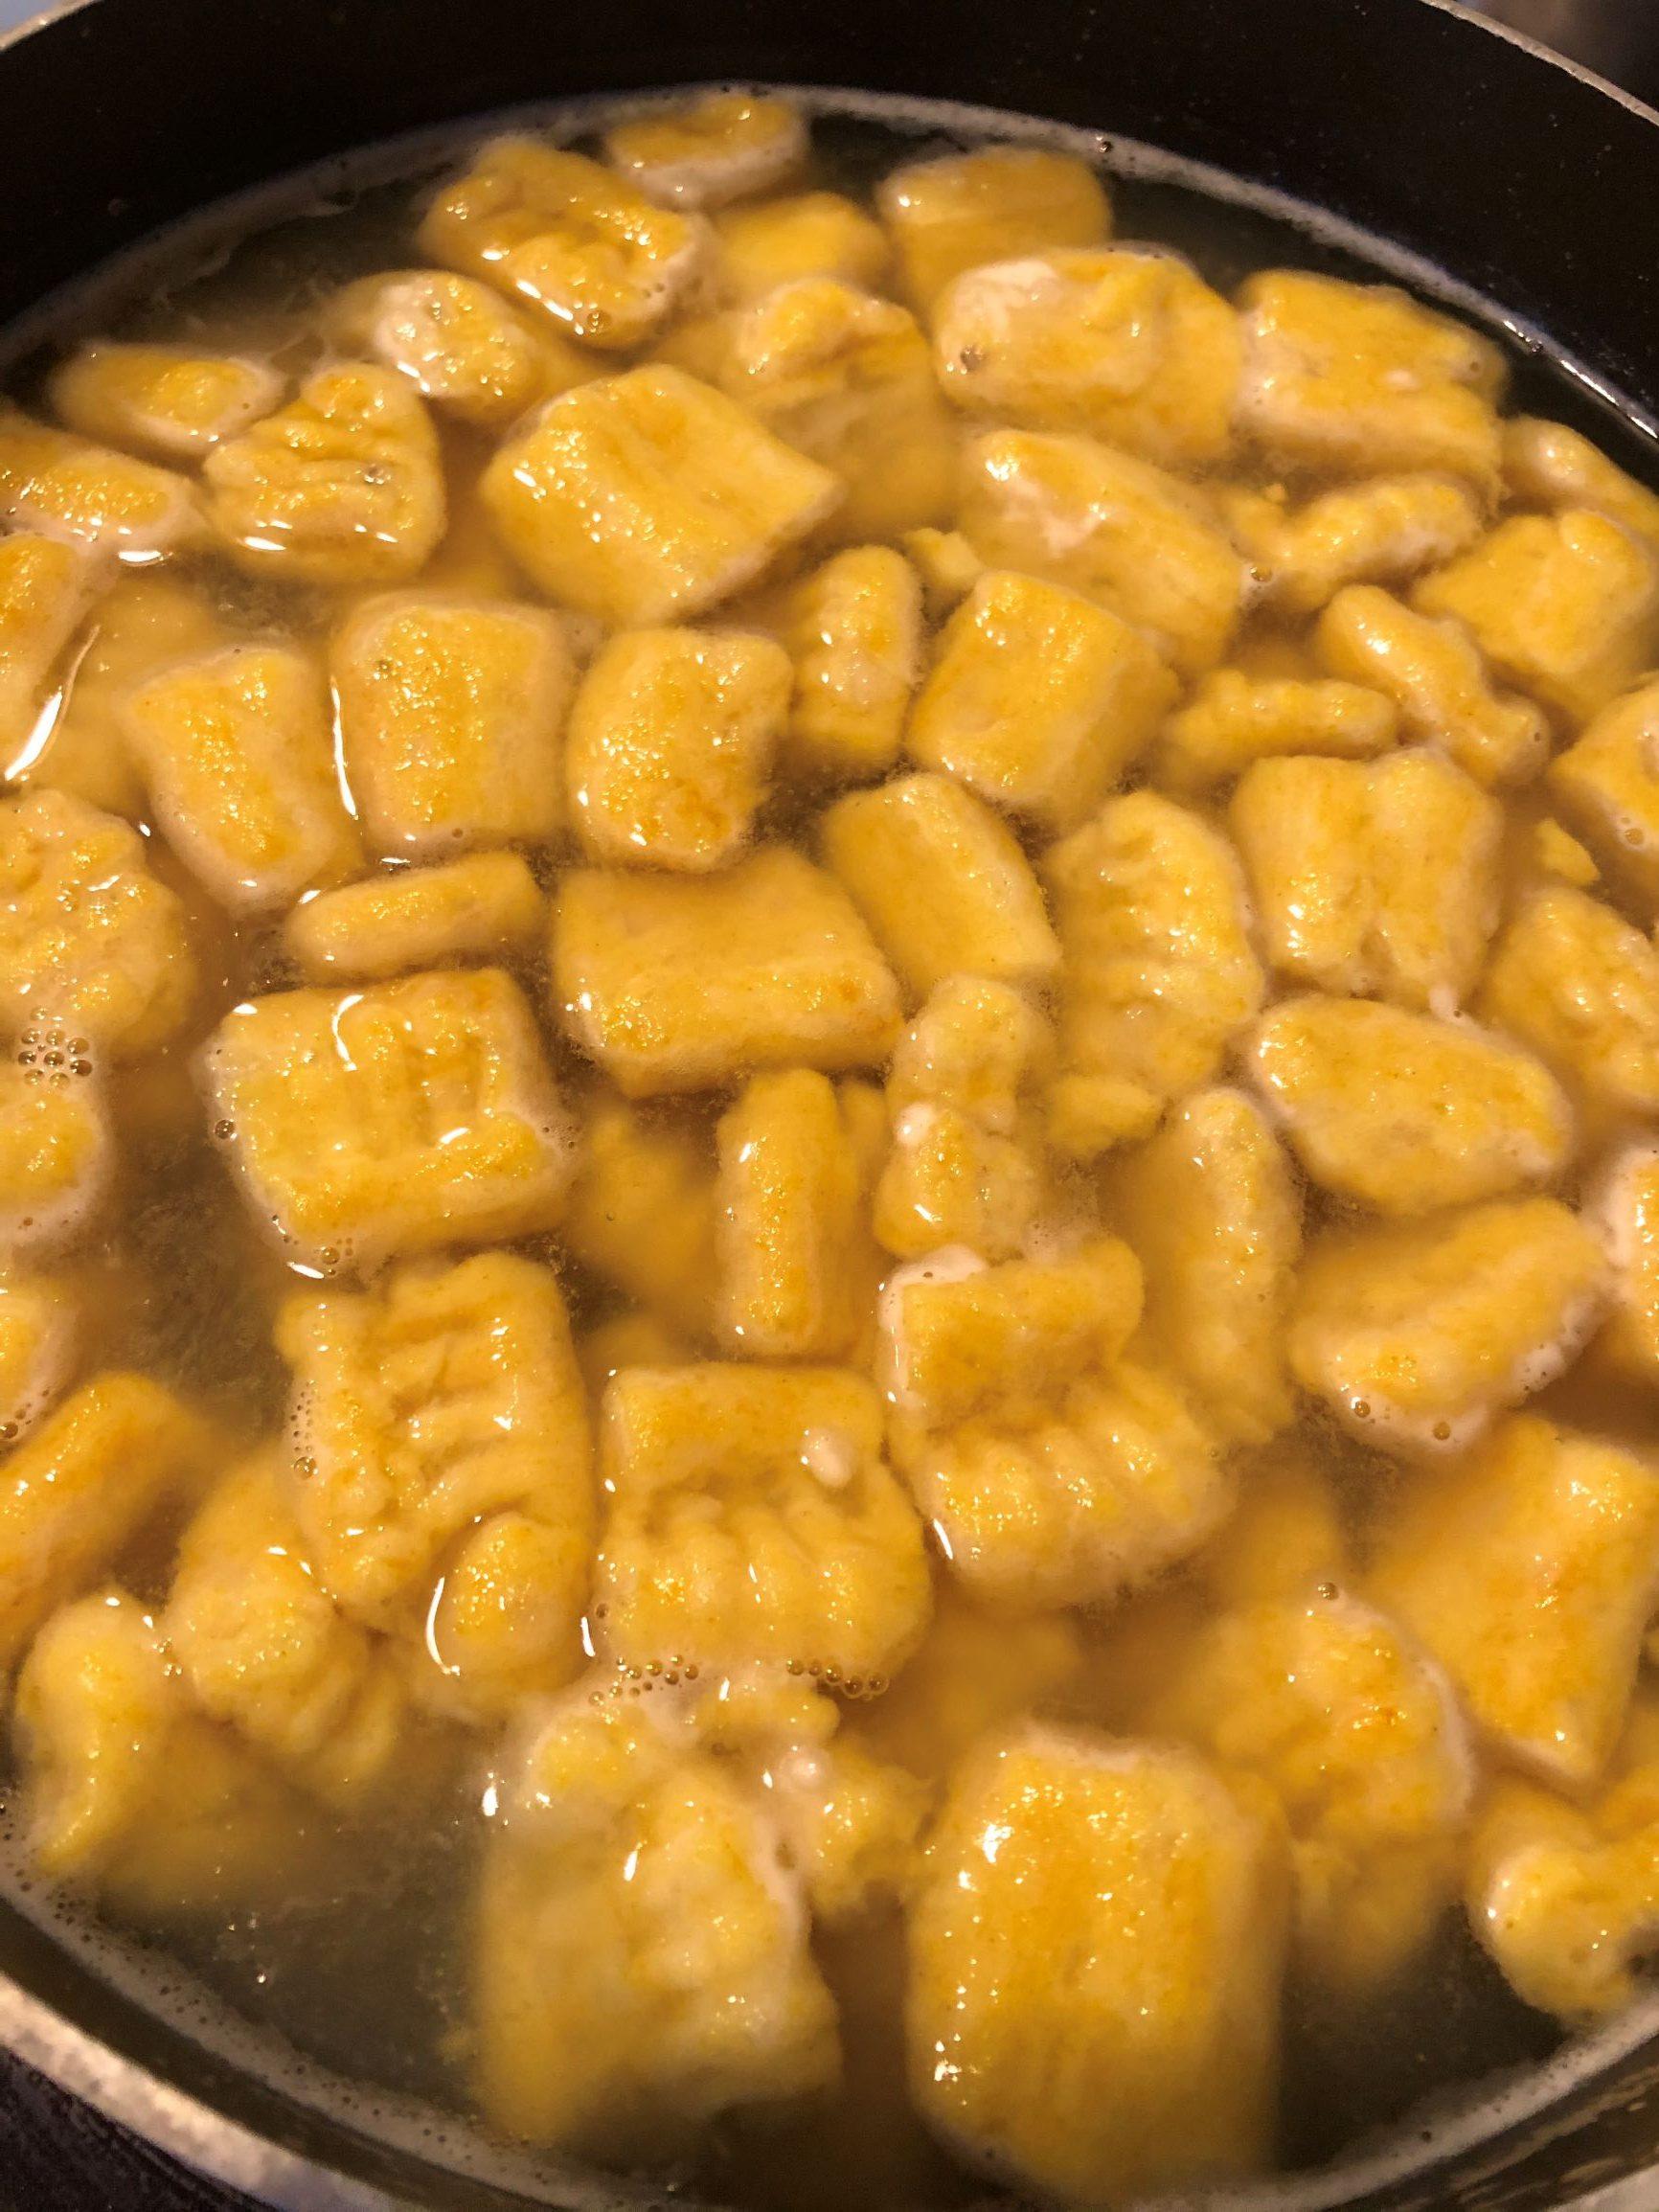 Gnocchi - Boiled gnocchi